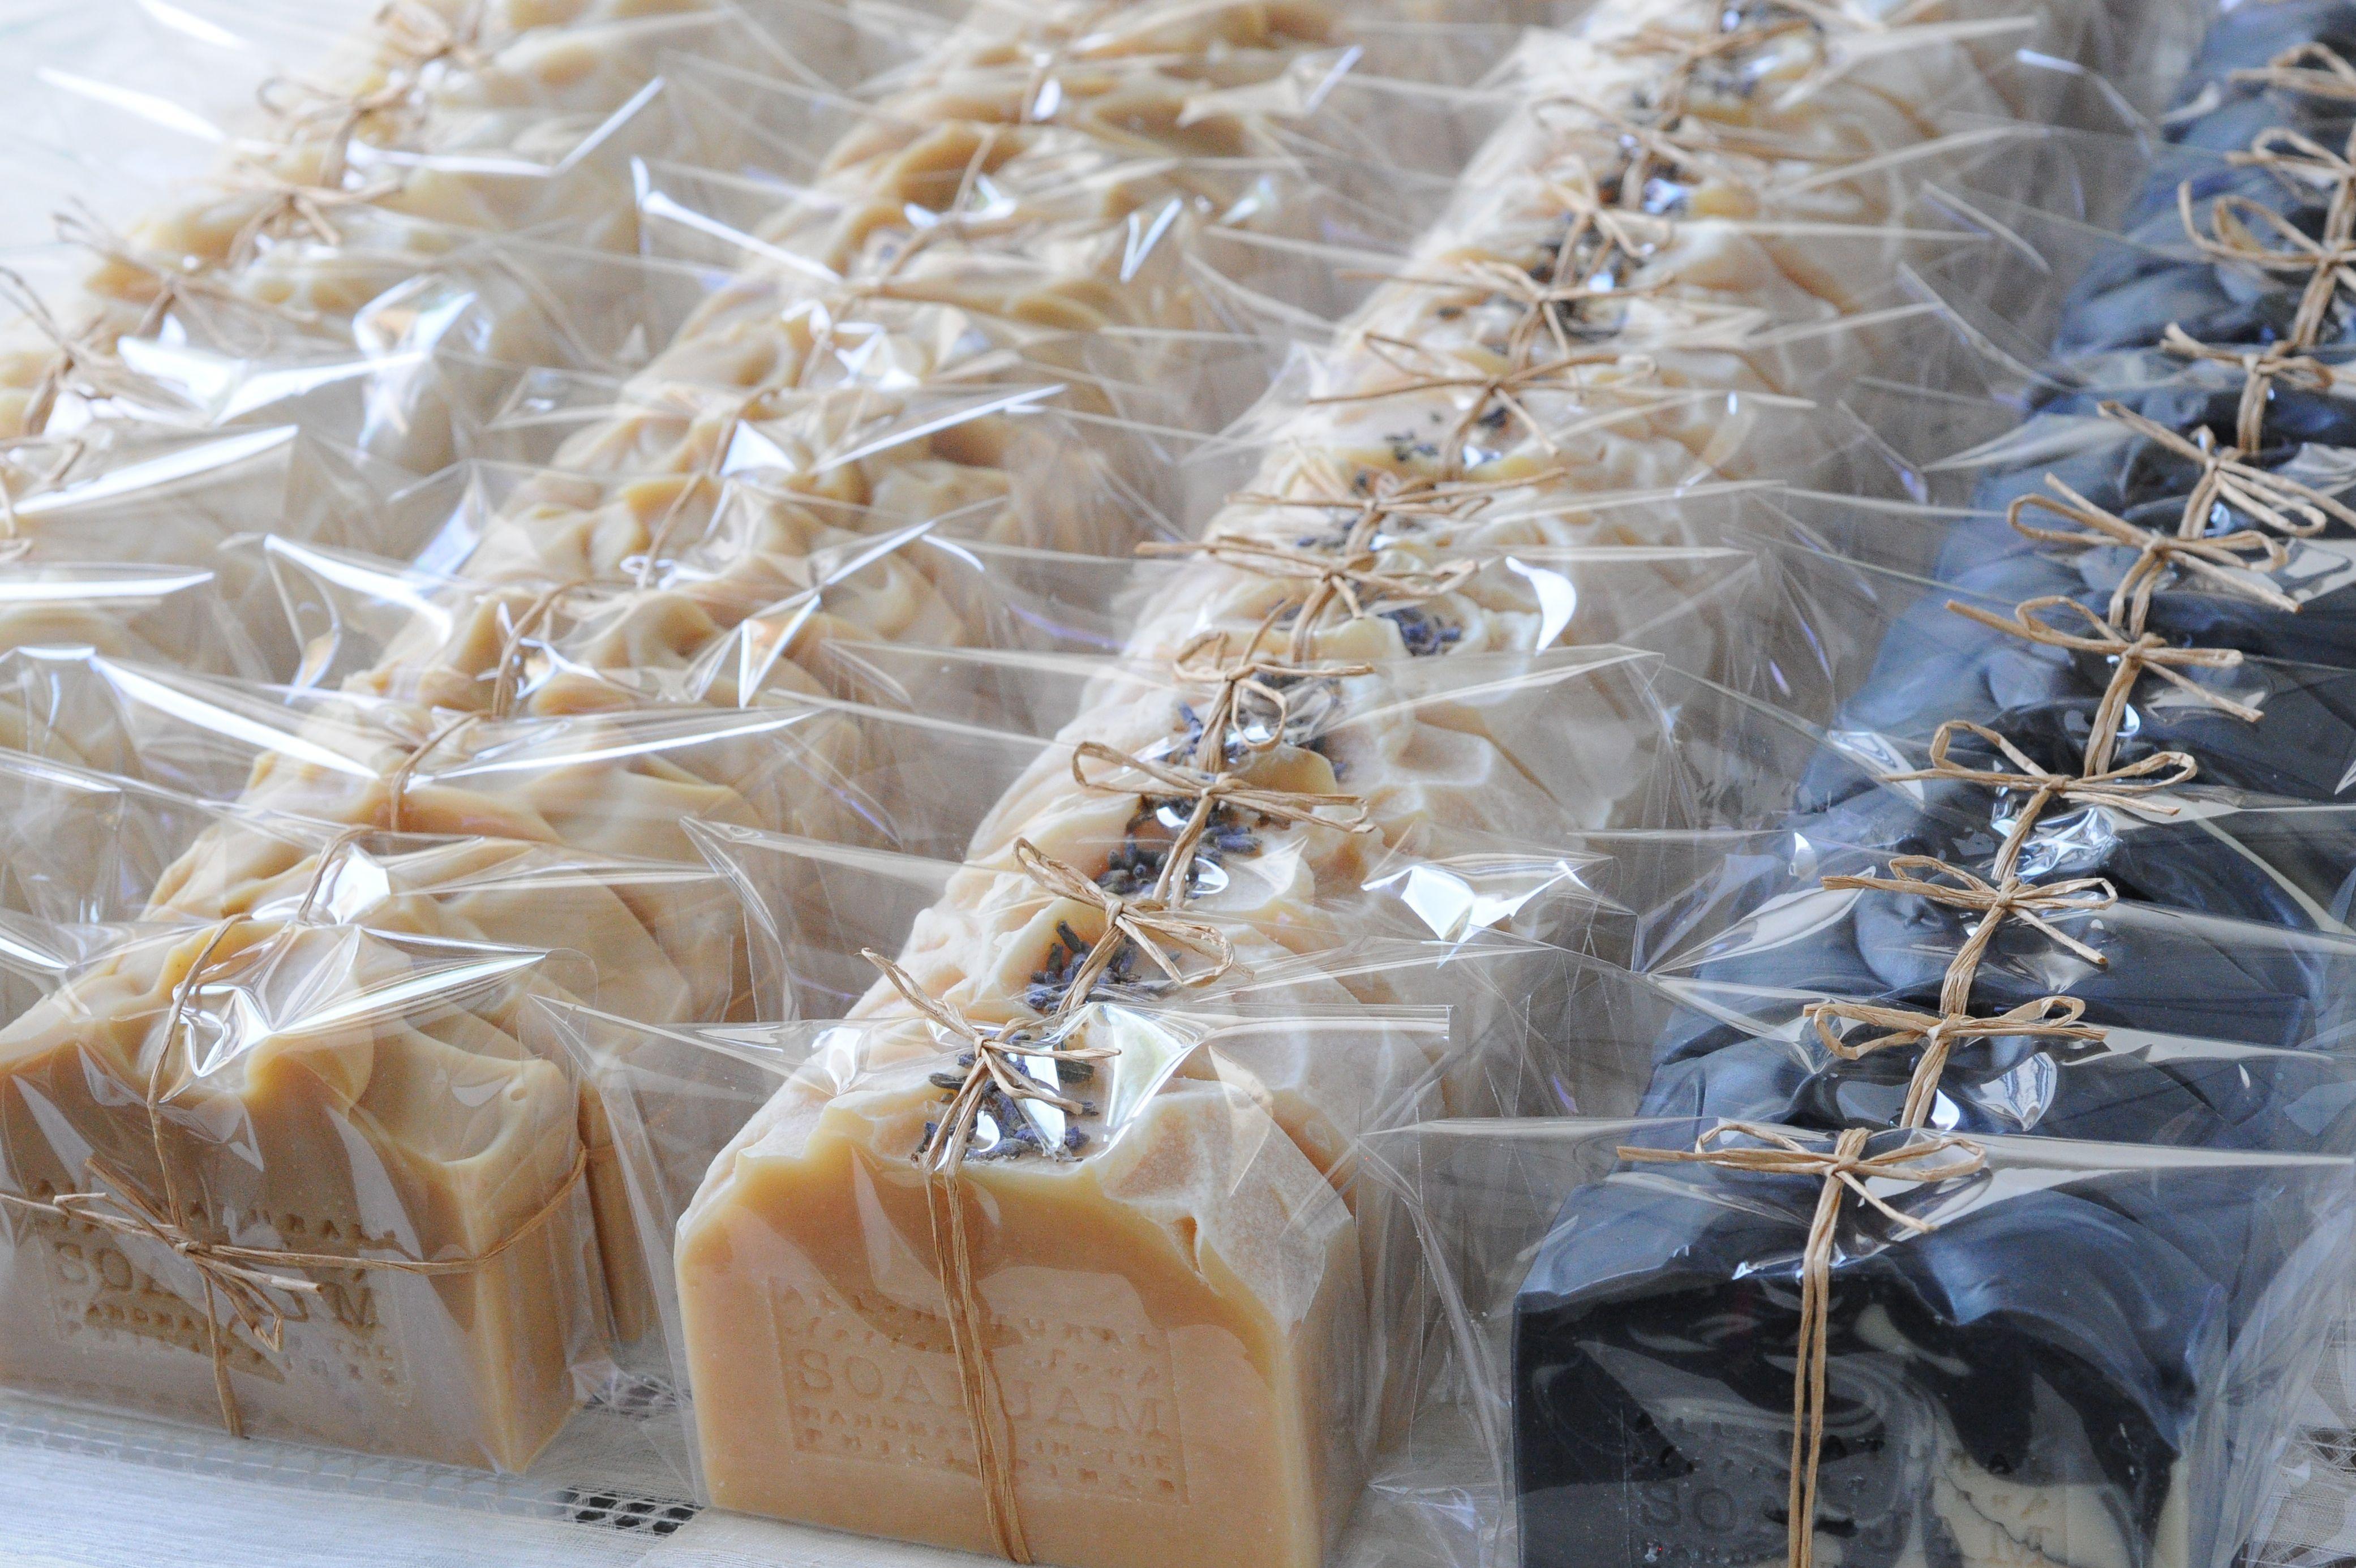 'Plastic Free Trust Mark' helps customers dodge plastic packaging